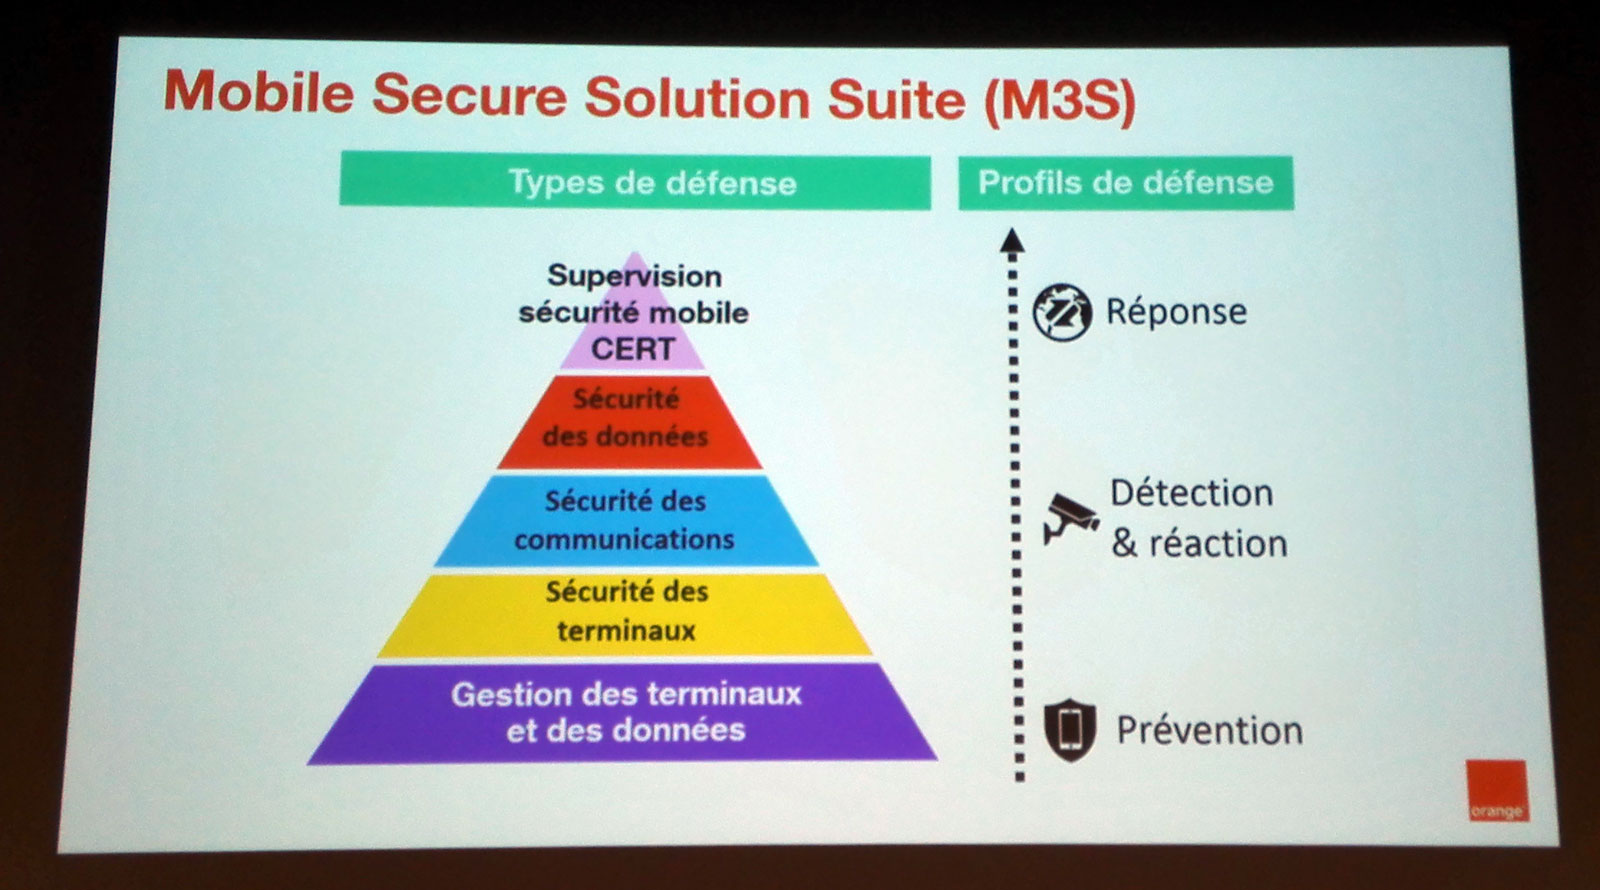 Mobile Secure Solution Suite